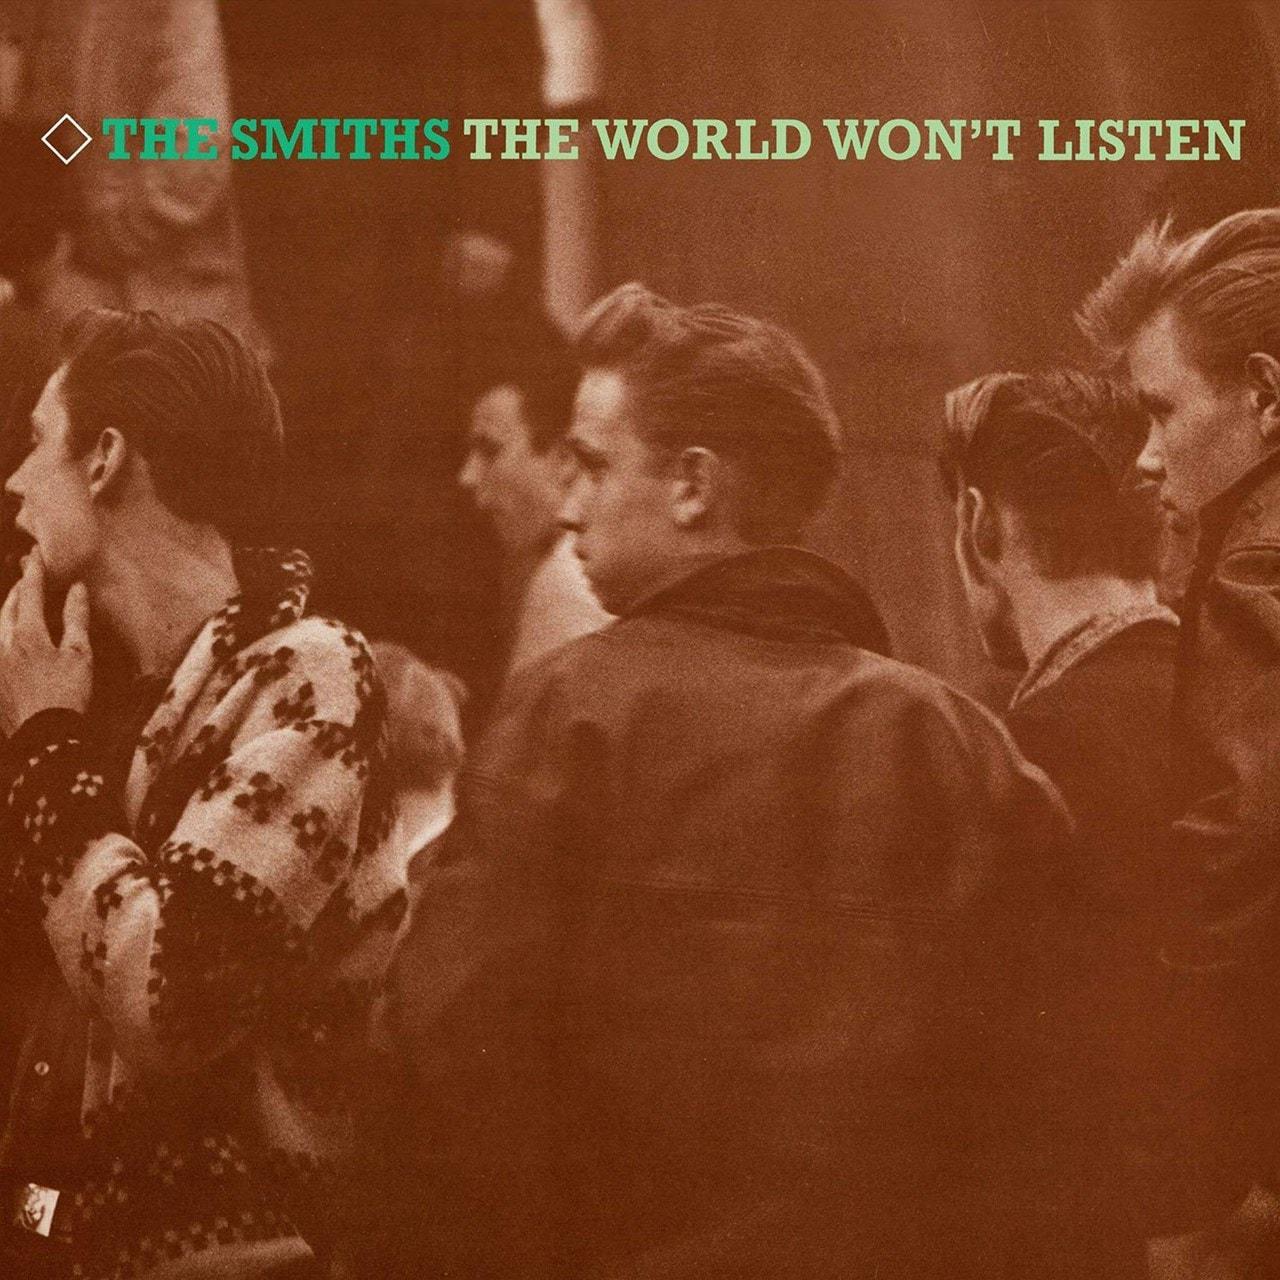 The World Won't Listen - 1